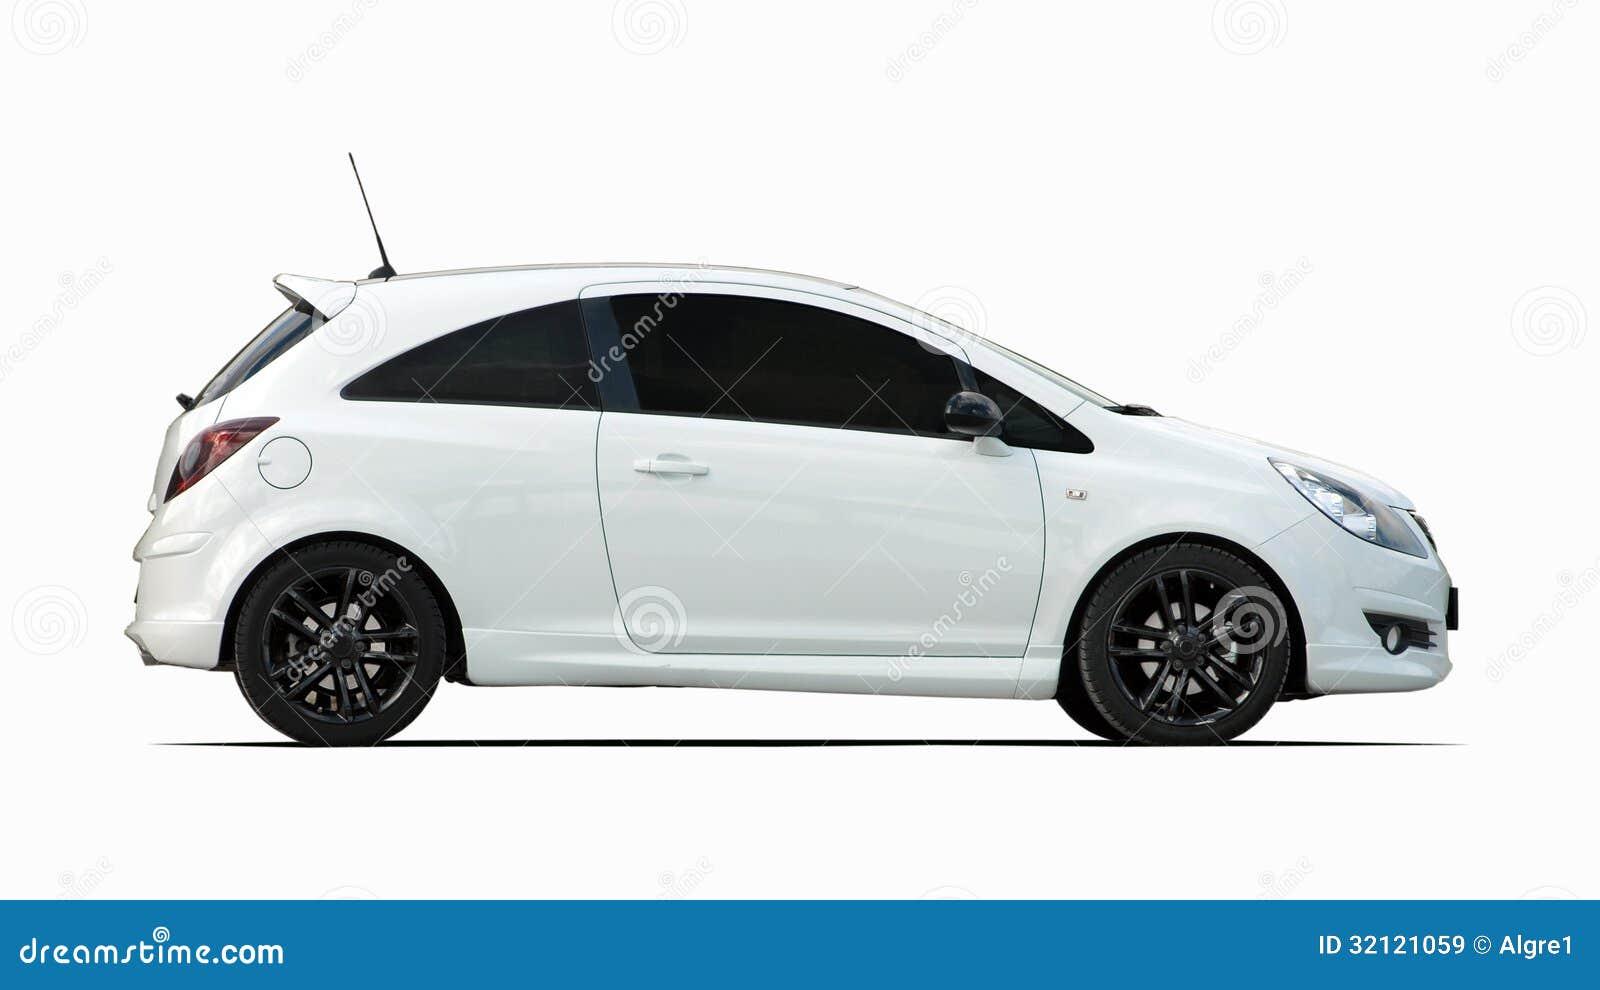 petite voiture de sport blanche image stock image du trappe automobile 32121059. Black Bedroom Furniture Sets. Home Design Ideas